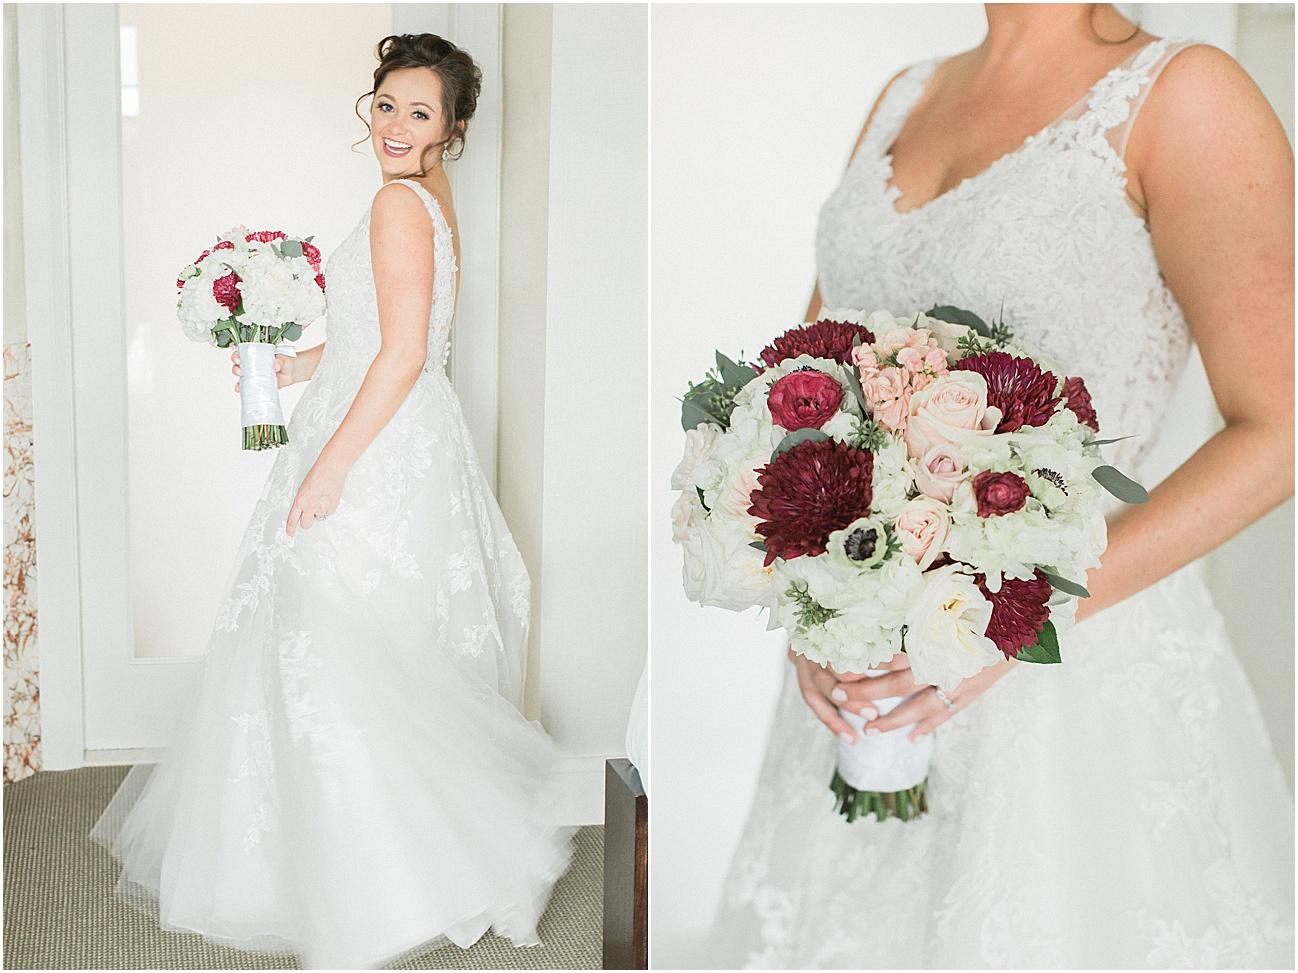 shannon_daniel_dan_atlantic_resort_saint_marys_st_mary_church_fall_newport_catholic_irish_cape_cod_boston_wedding_photographer_meredith_jane_photography_photo_1614.jpg